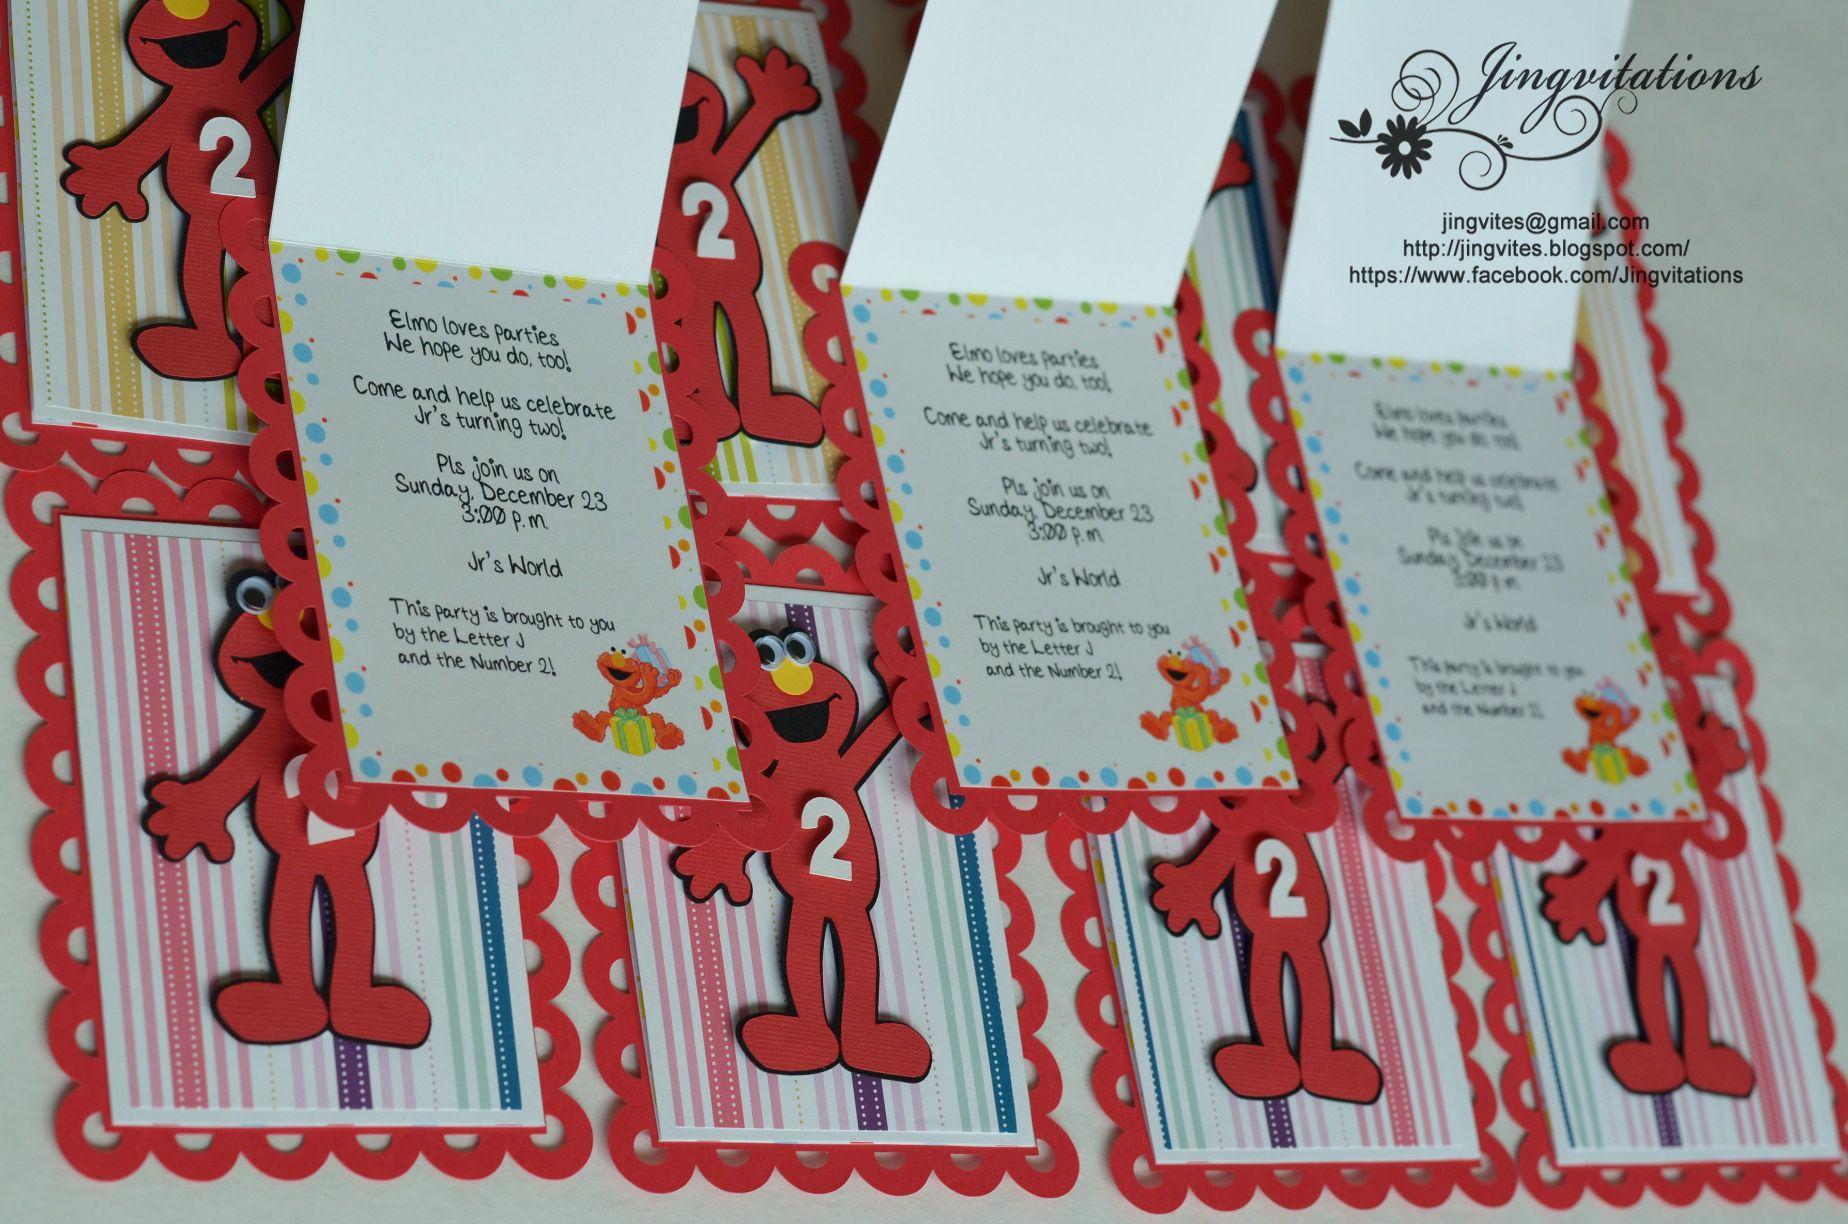 Elmo Invites 3 1848x1224 Pixels InvitationsHandmade InvitationsBirthday